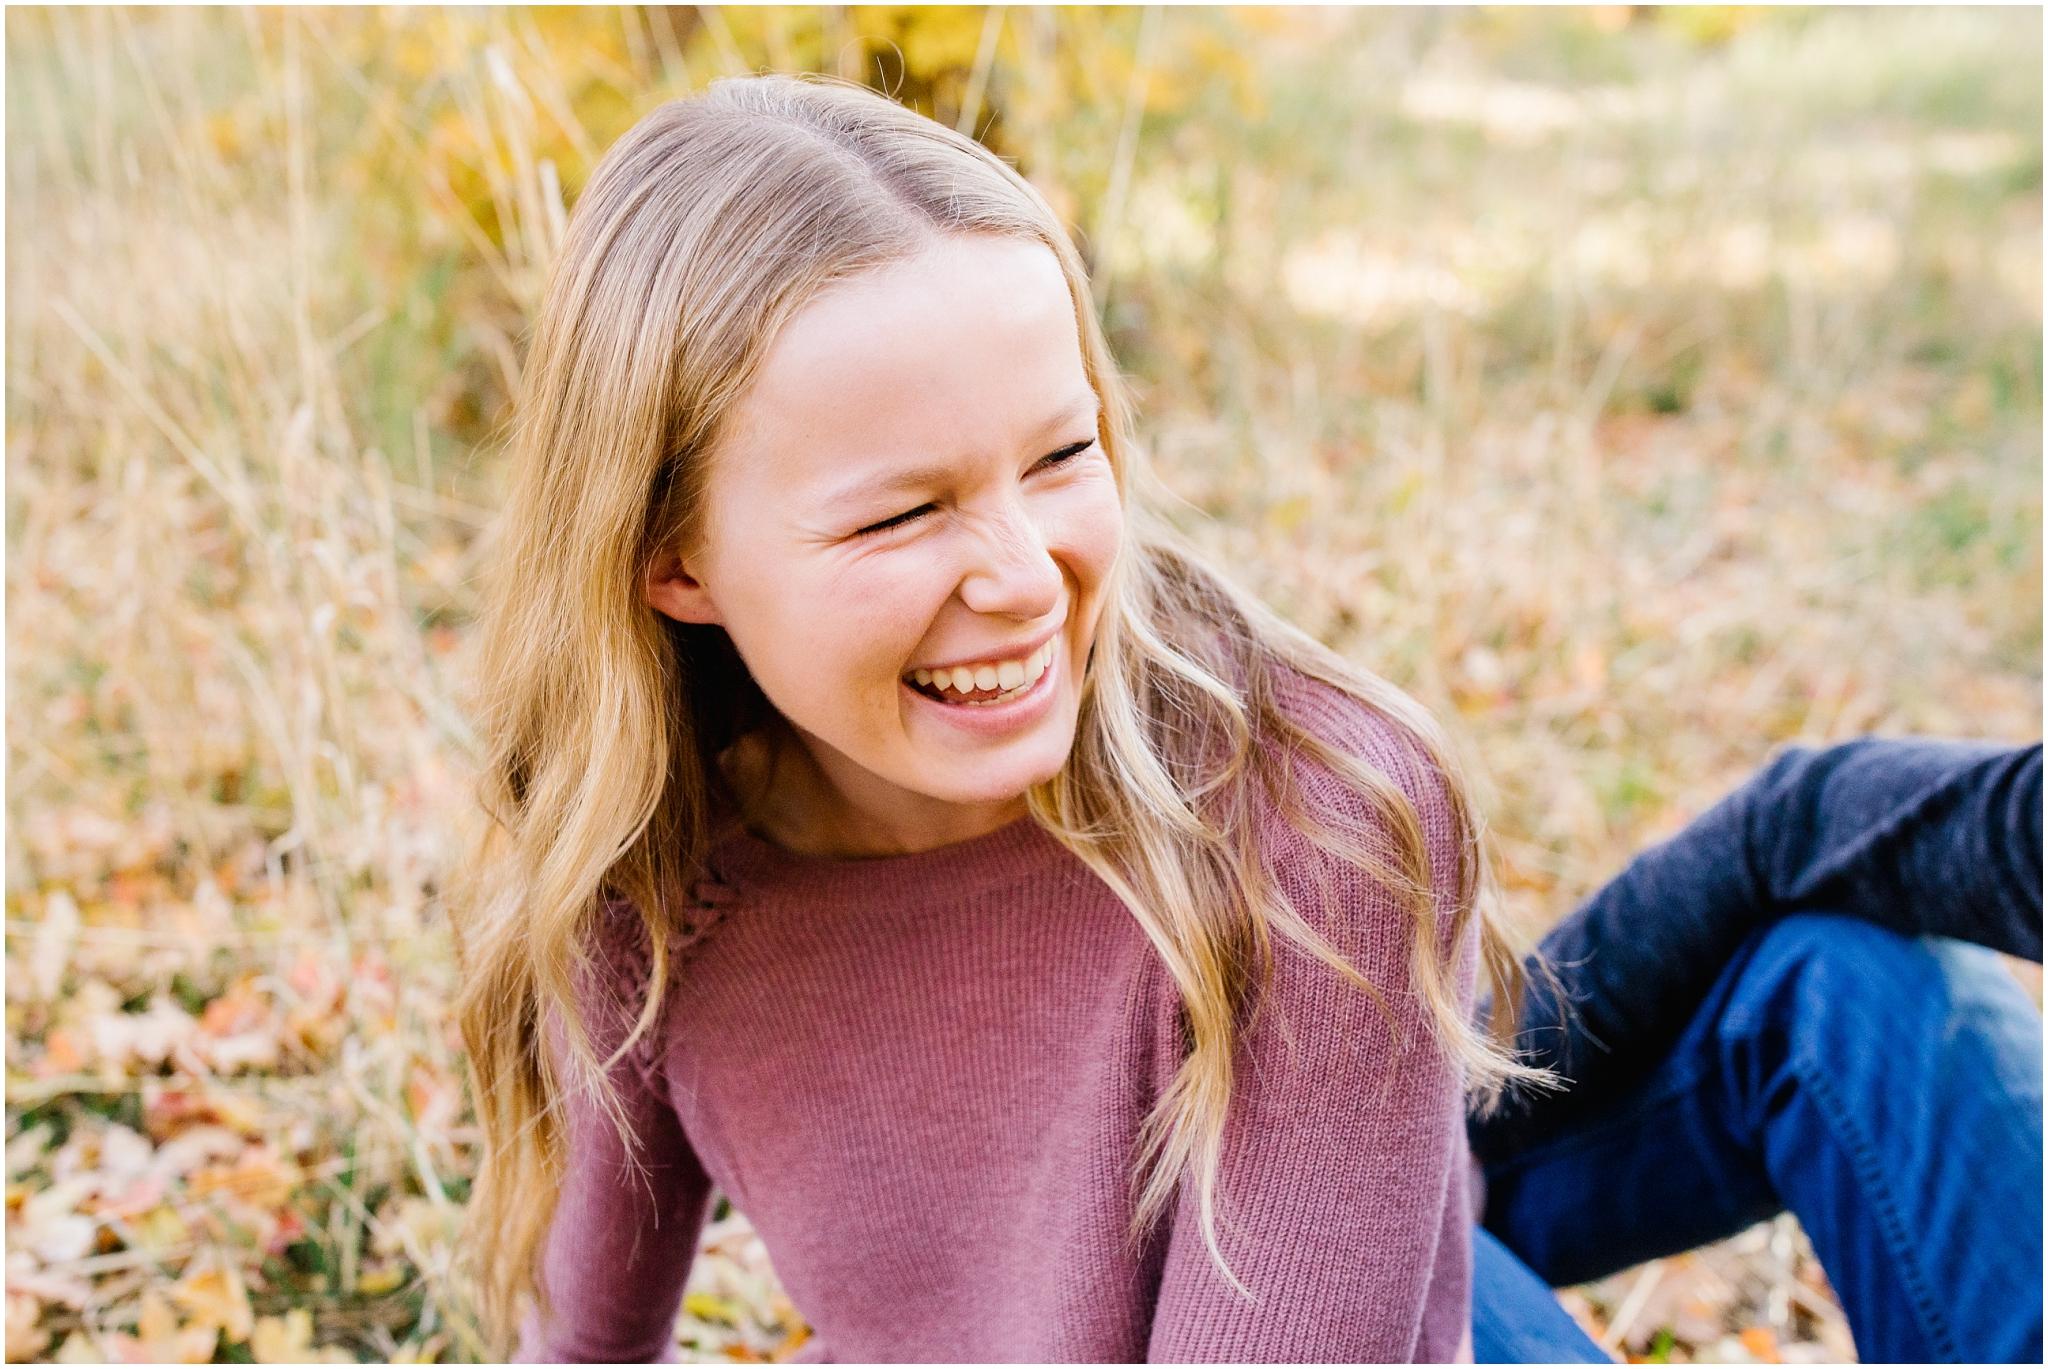 Nielsen--9_Lizzie-B-Imagery-Utah-Family-Photographer-Salt-Lake-City-Park-City-Utah-County-Hobble-Creek-Canyon-Jolleys-Ranch.jpg